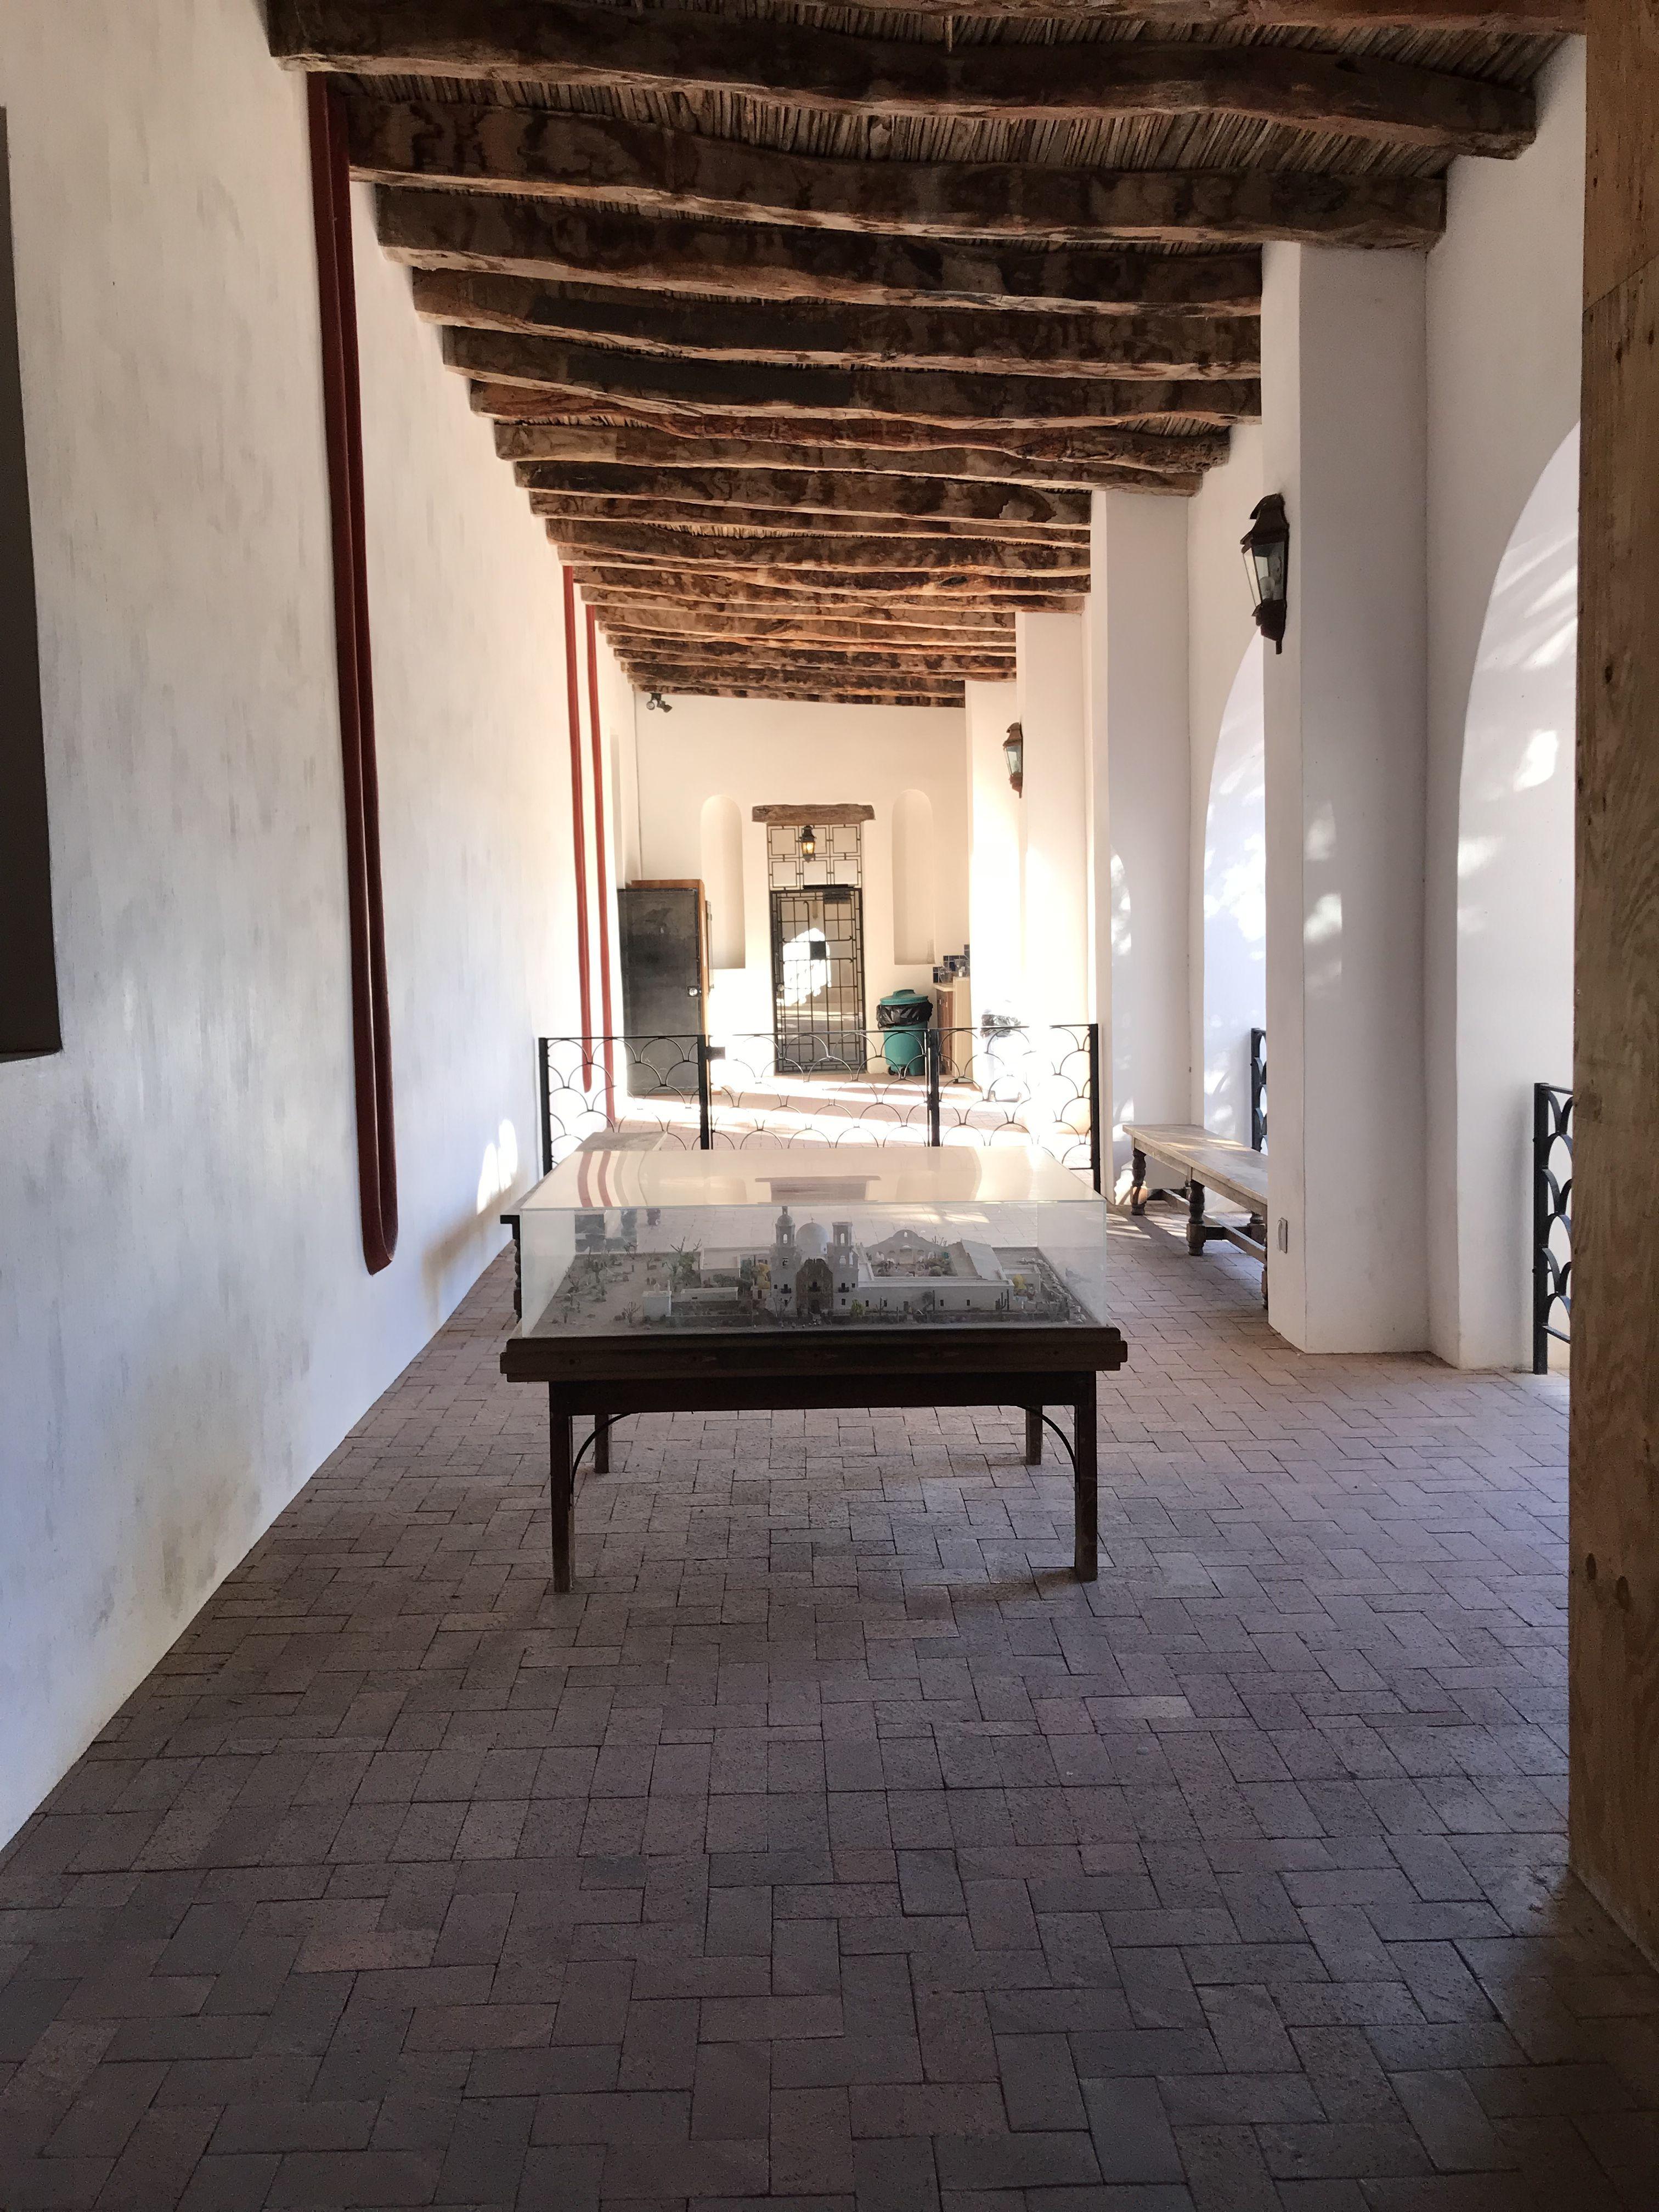 Mission San Xavier   Home, Home decor, Decor